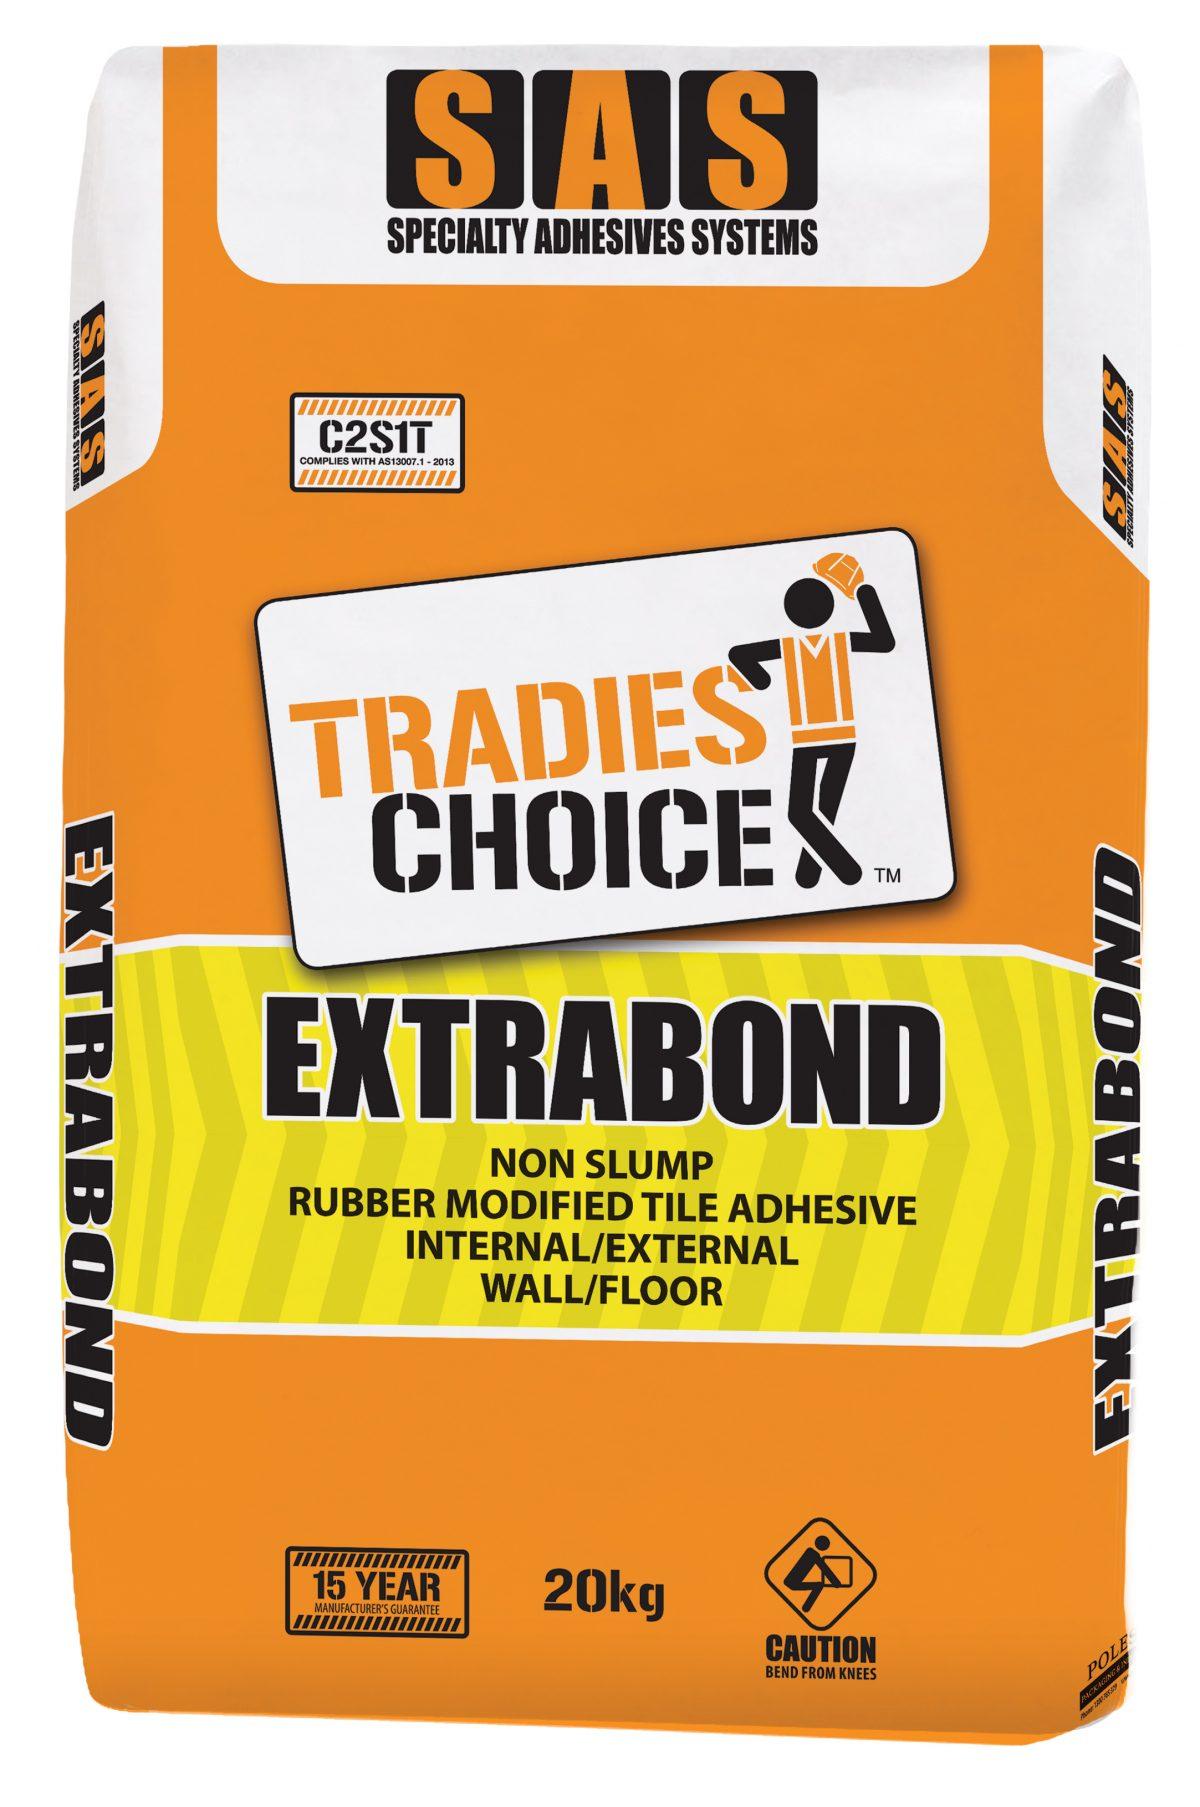 TRADIES CHOICE EXTRABOND 20kg ADHESIVE